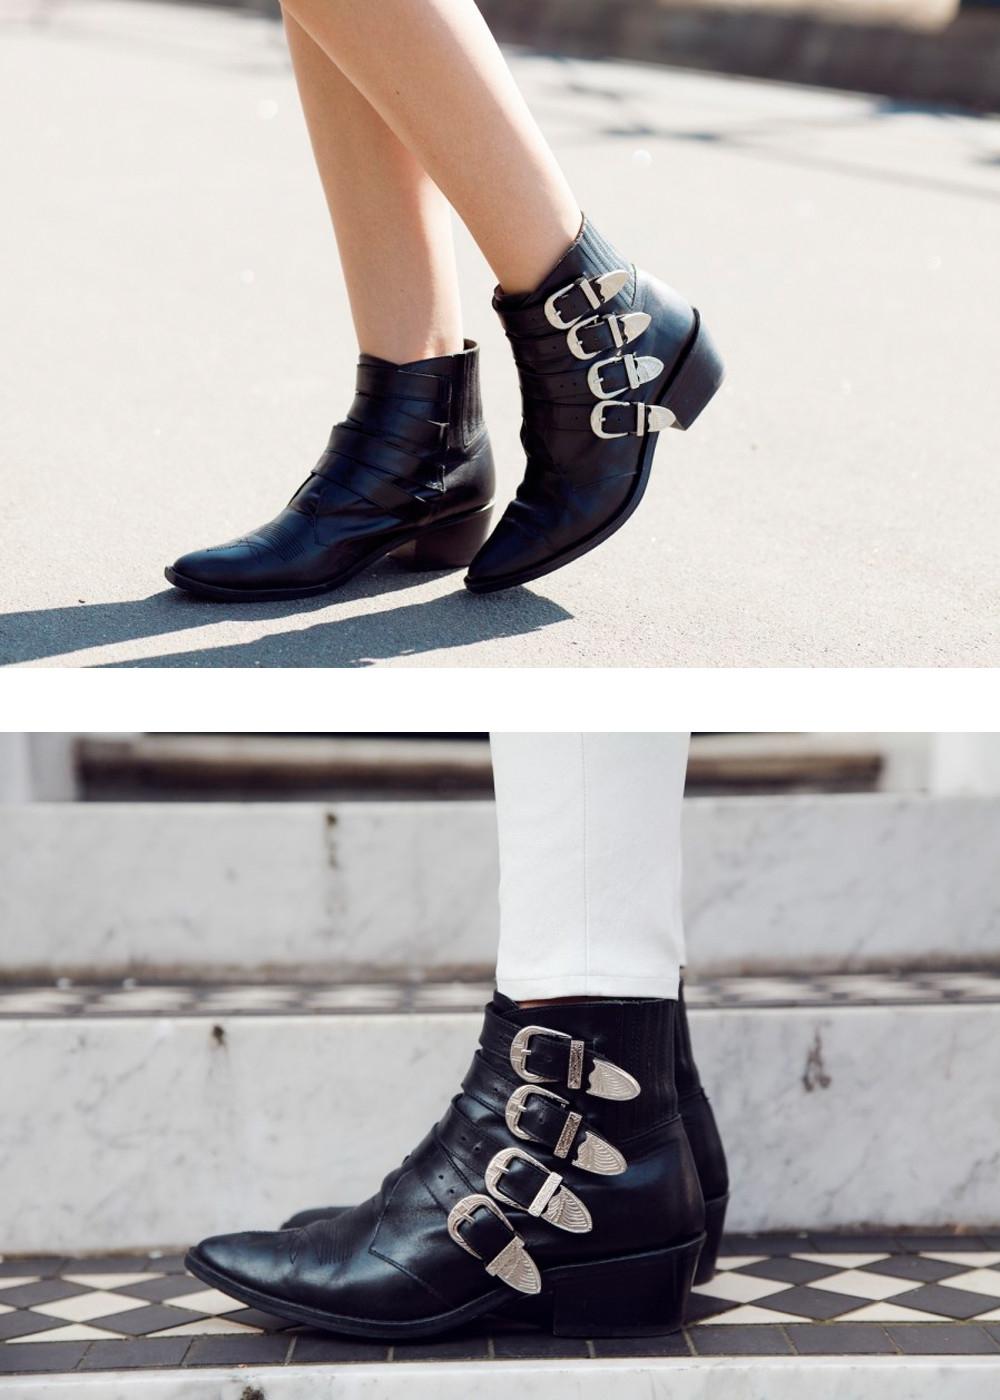 toga pulla restocked black leather western buckle ankle